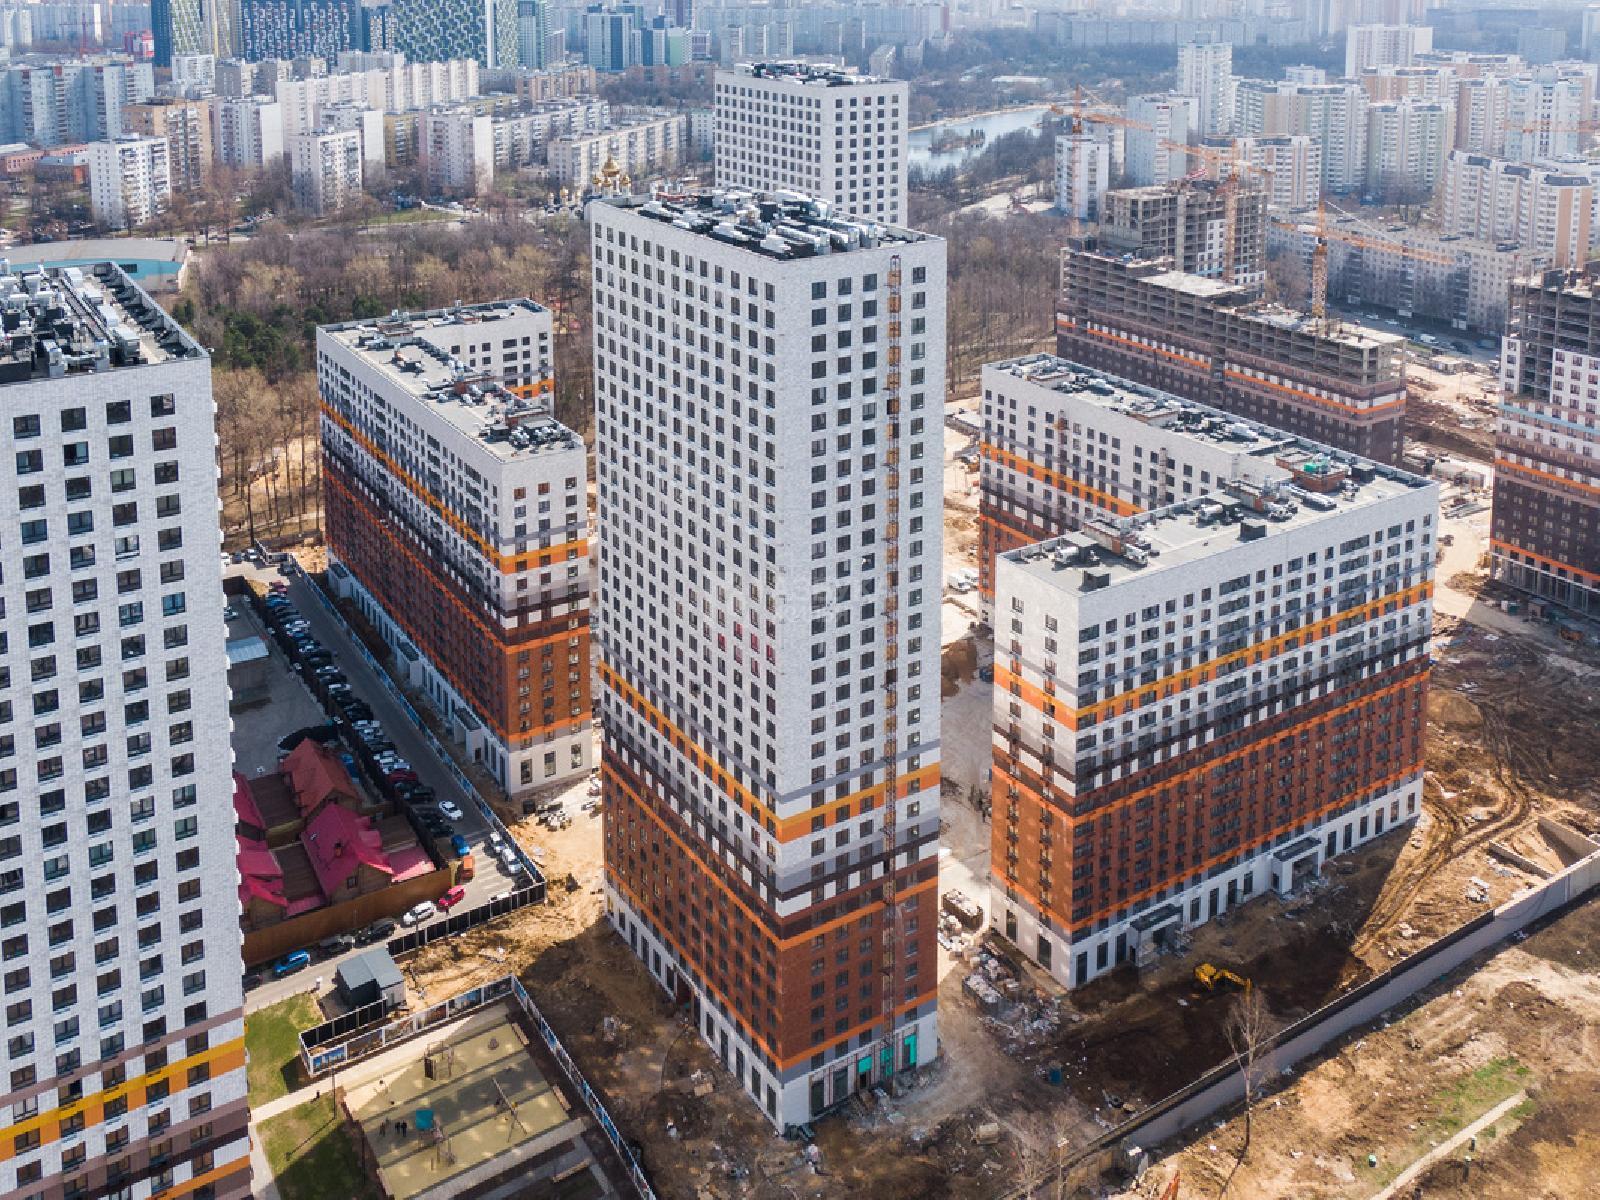 Фото №1 - 1-комнатная квартира, Москва, Лобненская улица 13 корпус 2, метро Селигерская